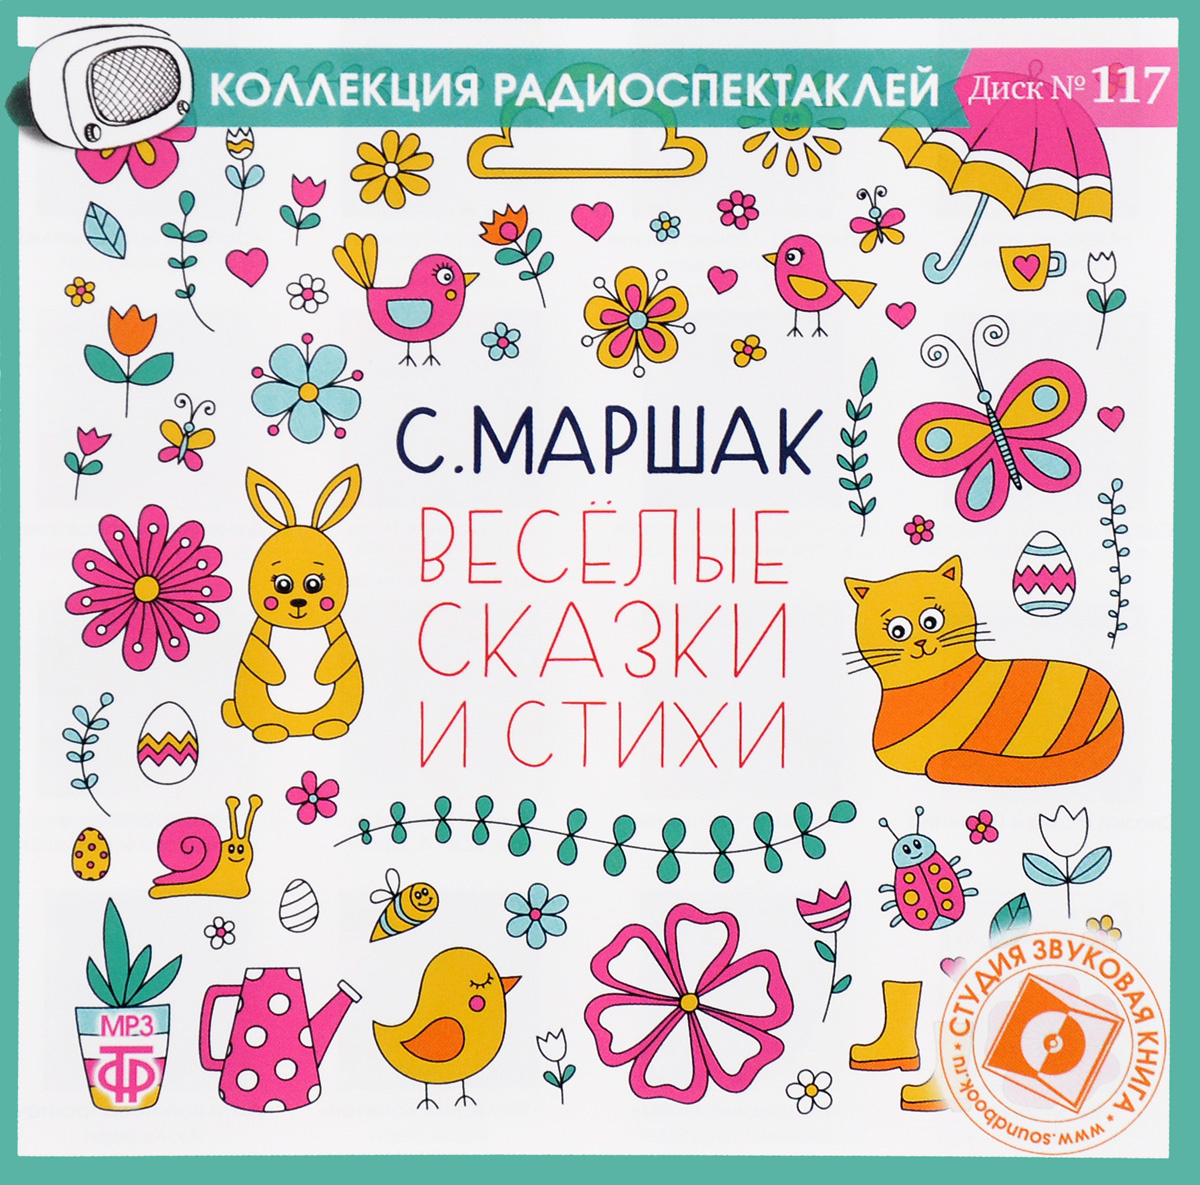 С. Маршак. Веселые сказки и стихи (аудиокнига MP3)   Маршак Самуил Яковлевич  #1